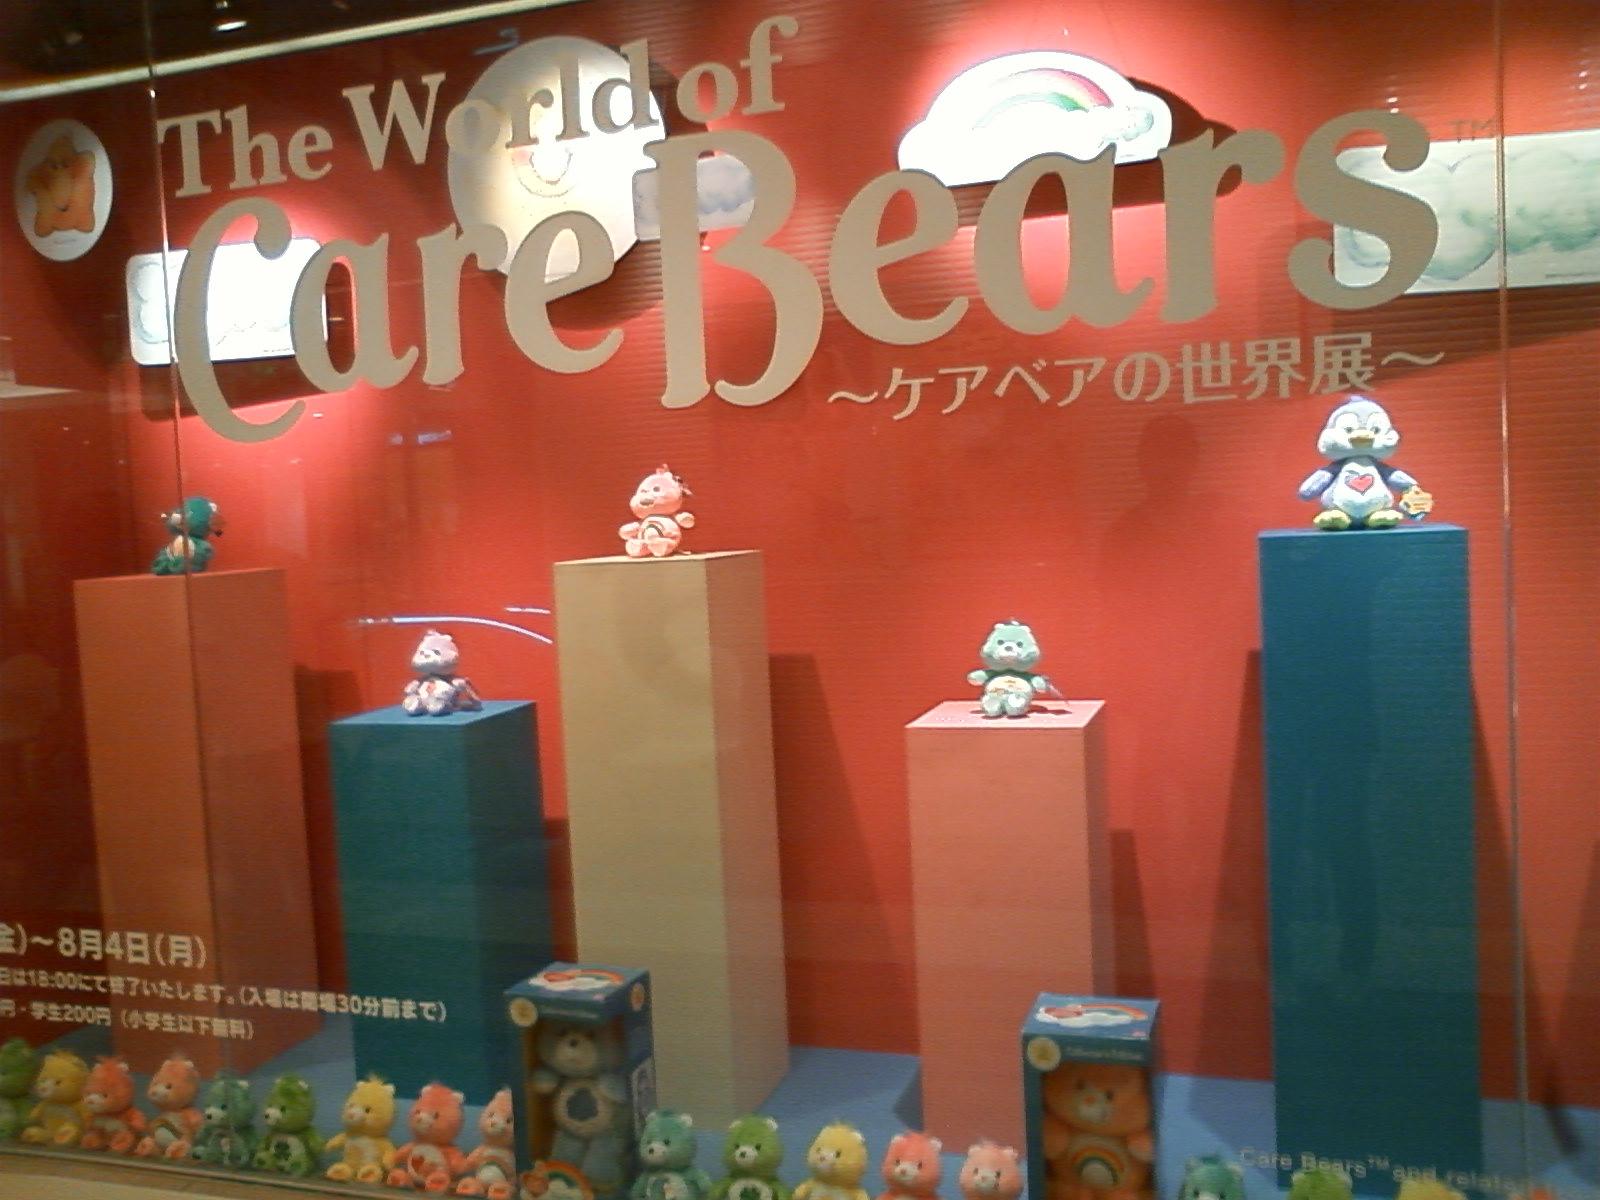 Care Bears_c0127070_21344125.jpg